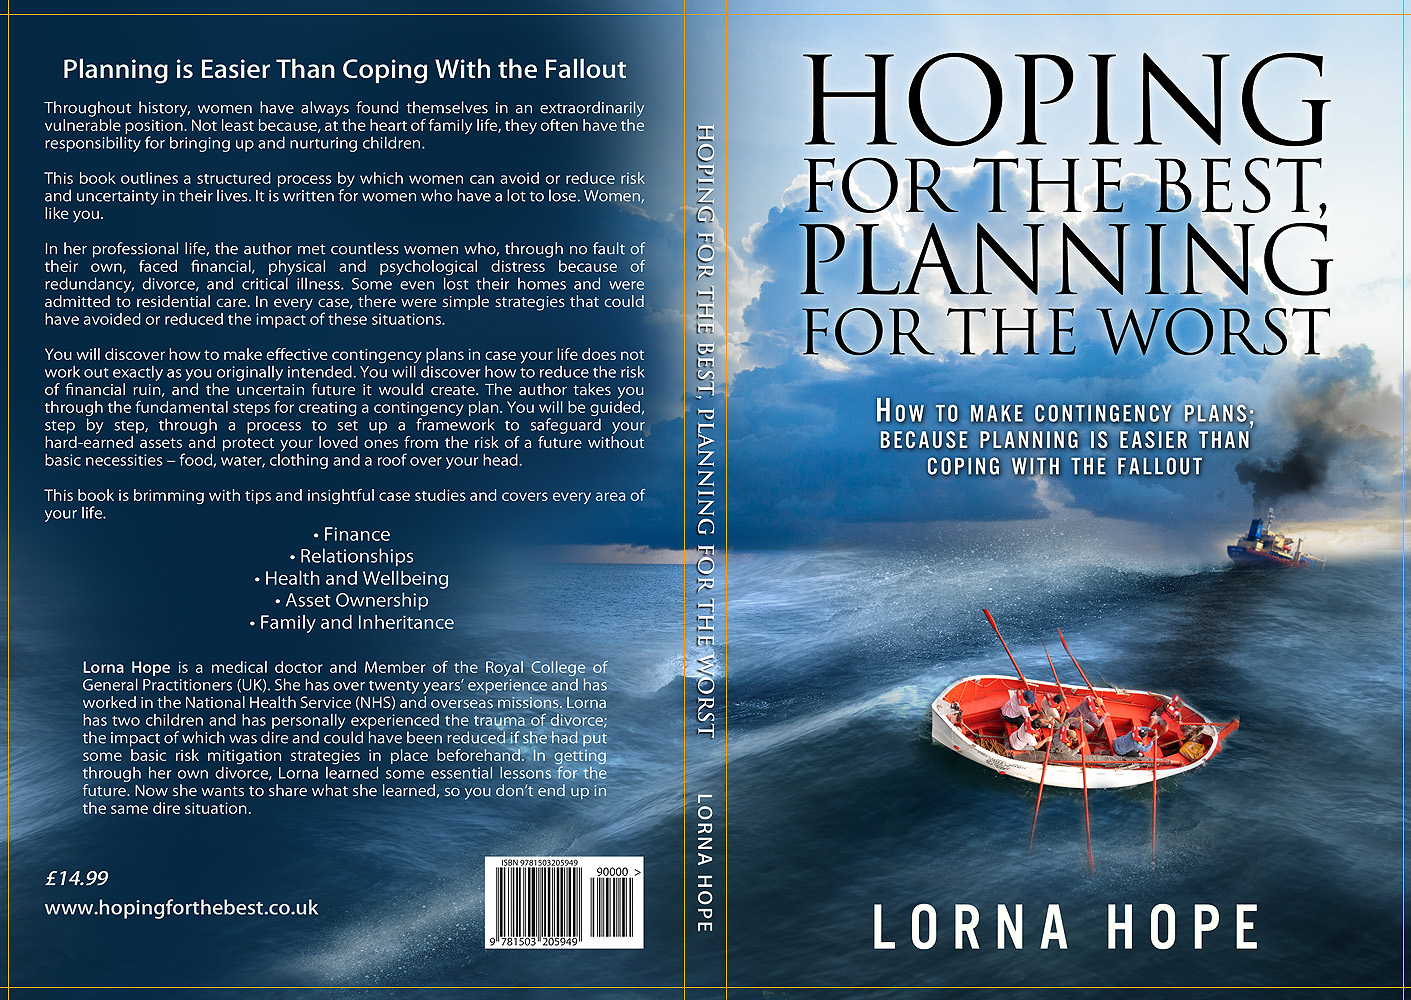 How To Create A Book Cover Design ~ Feminine book cover designs book publisher book cover design